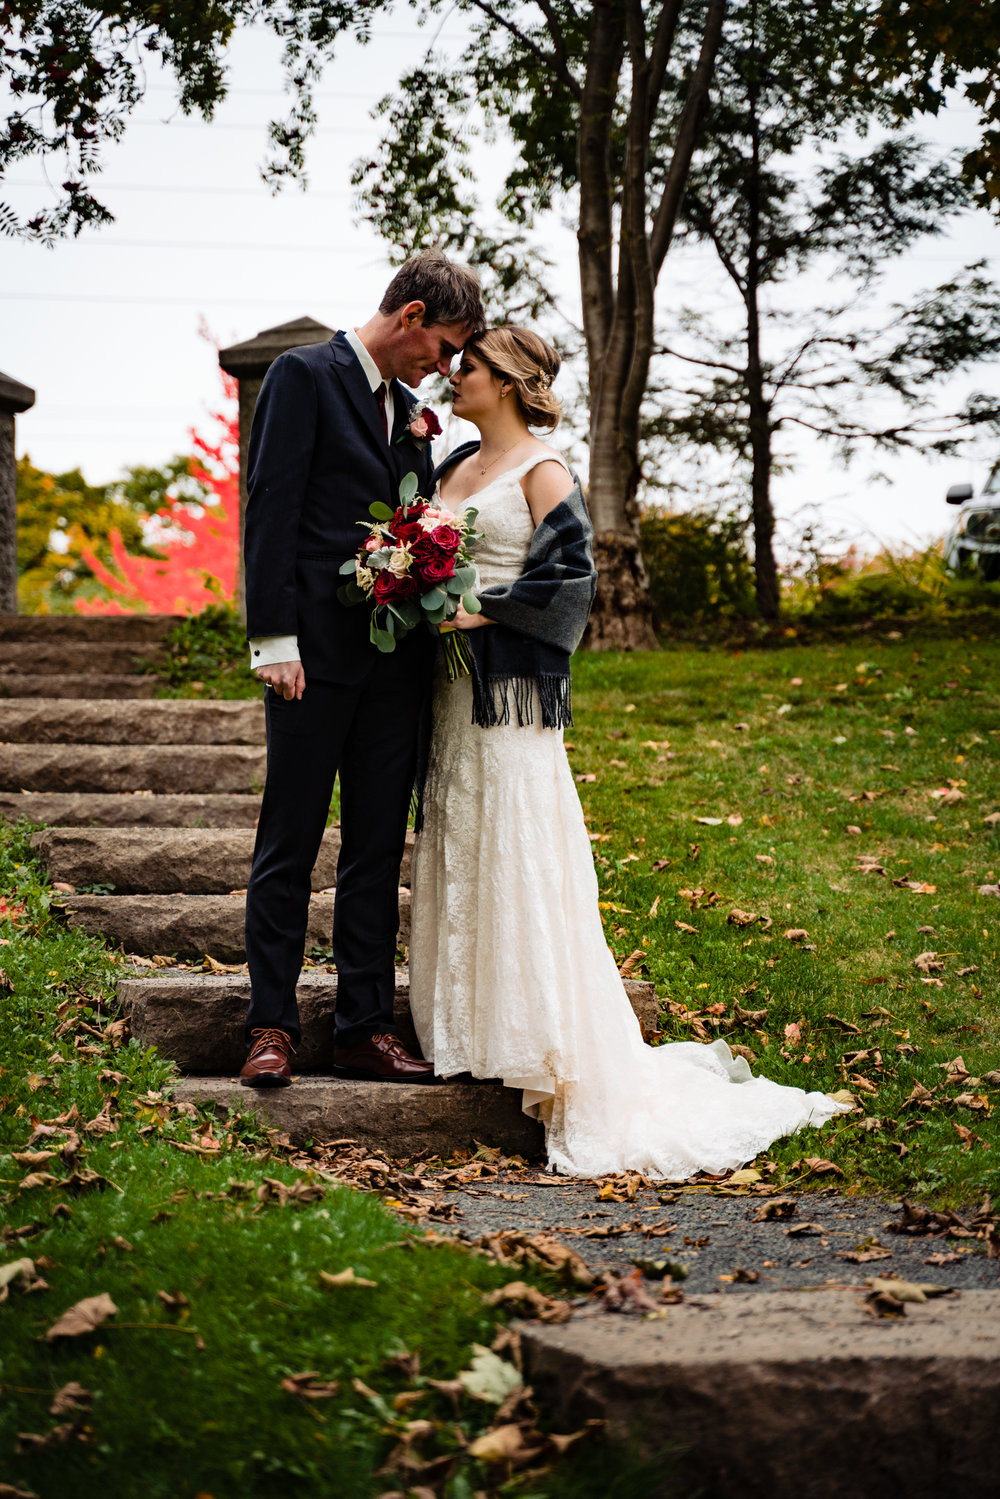 Waegwoltic-Halifax-Wedding-venue-novascotia-ottawa-ontario (91 of 141).jpg